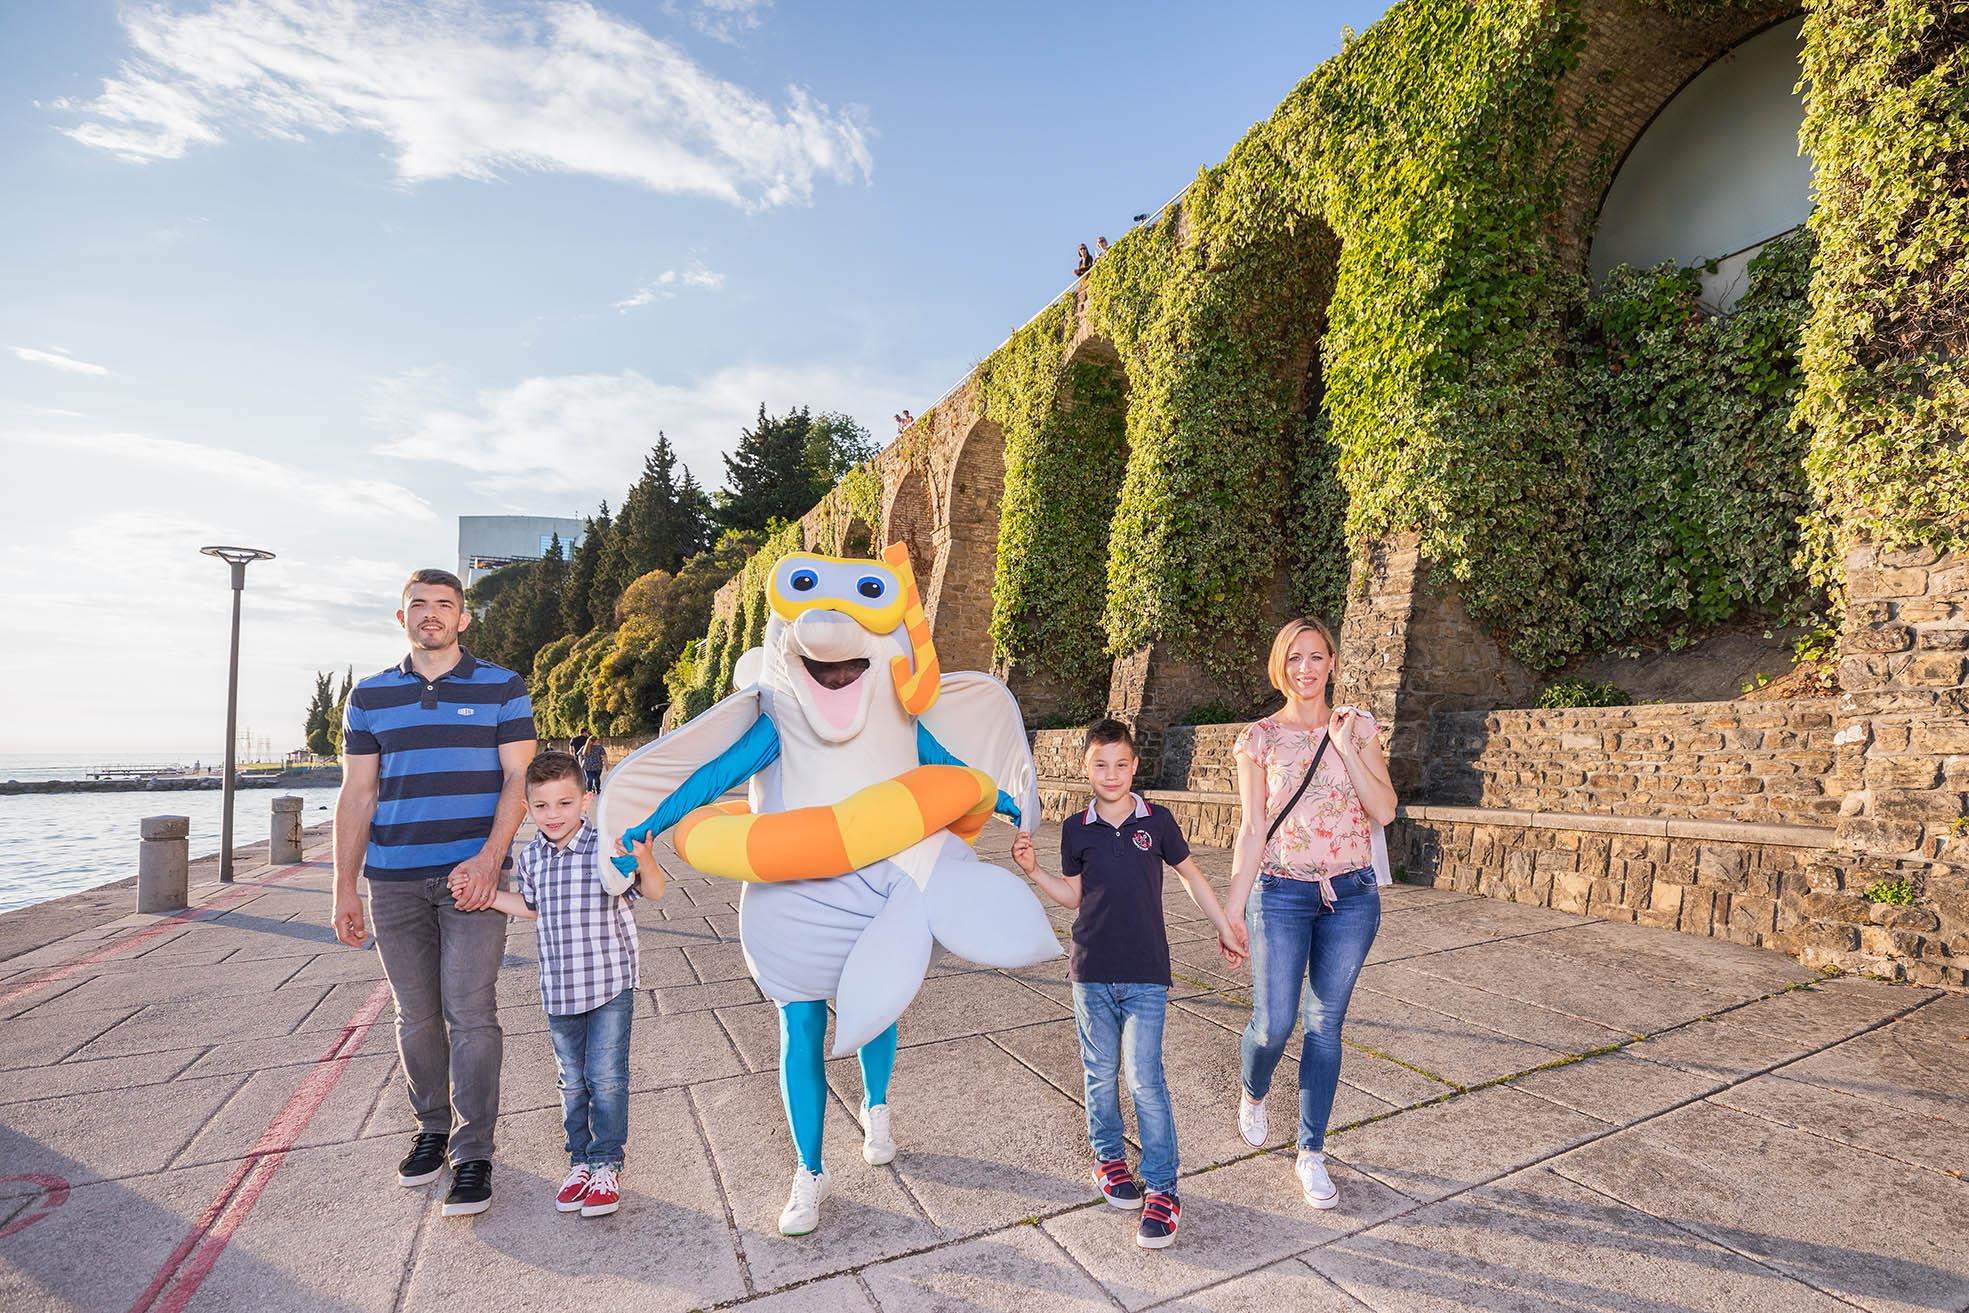 Family on Promenade Bernardin_SBP_06_Photo_JI_ junij 2019_lowres